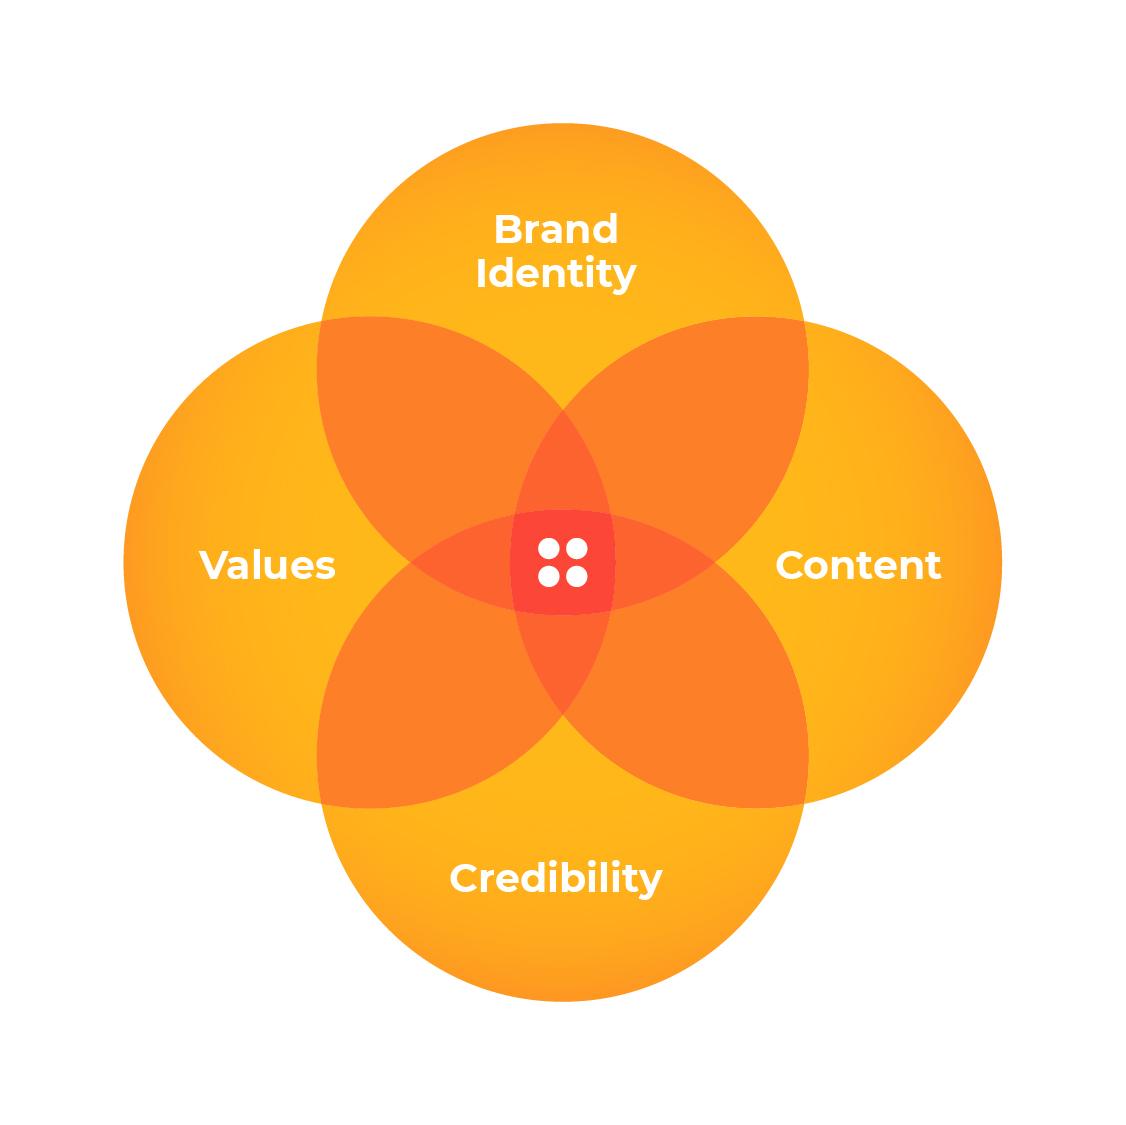 Branding elements - identity, values, content, credibility